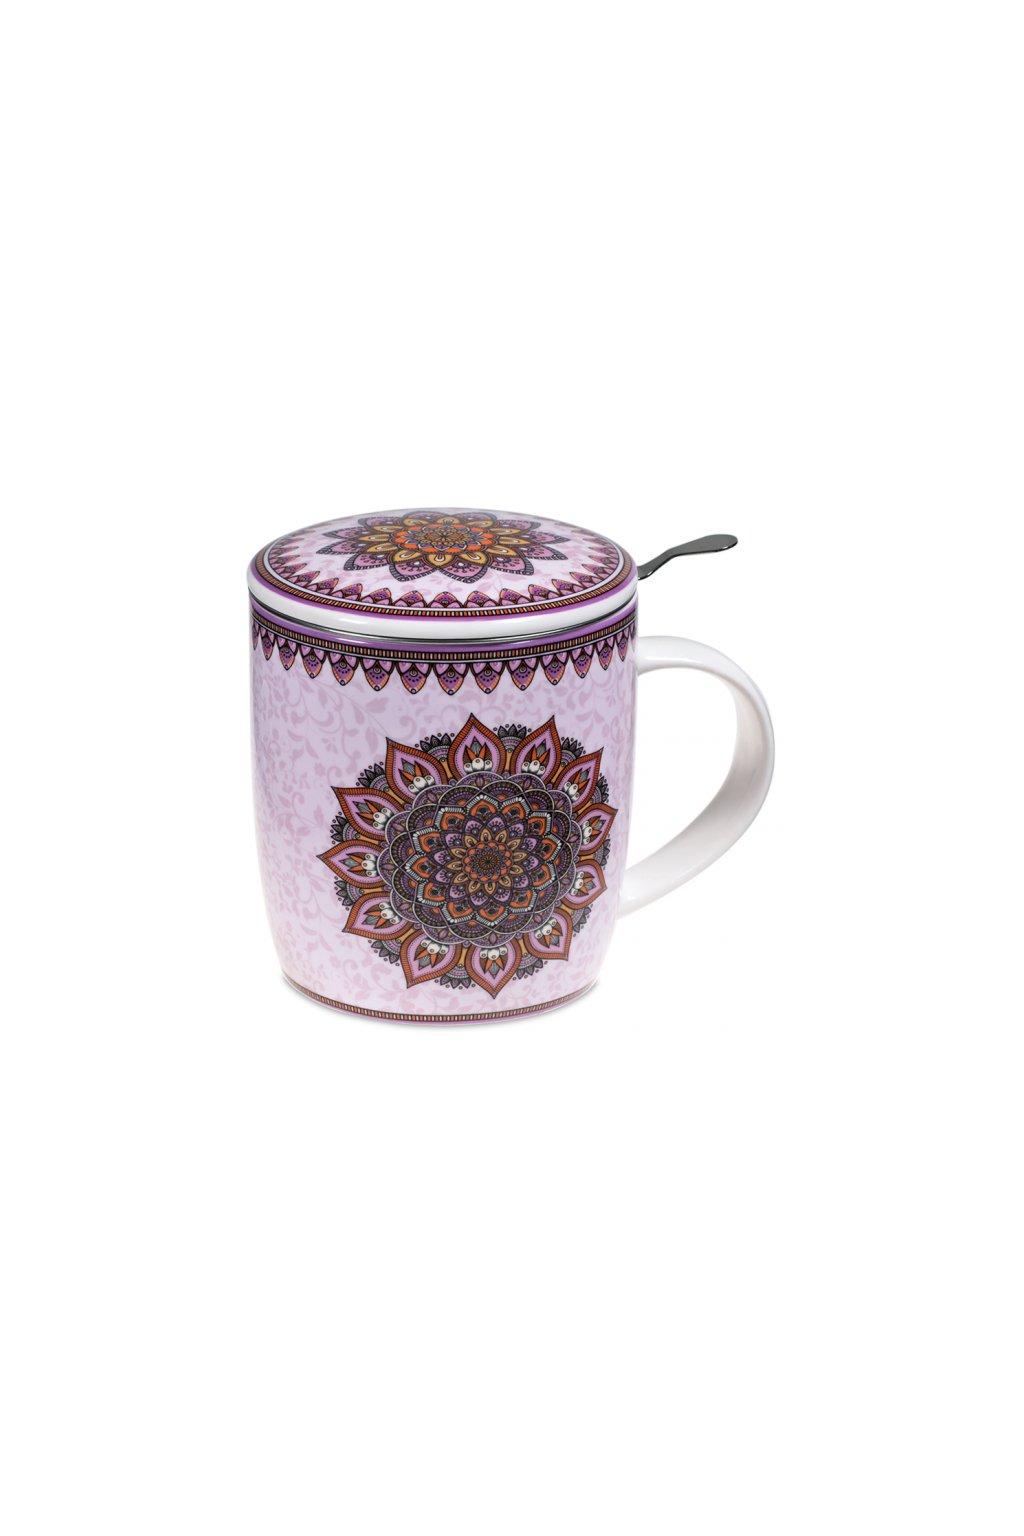 Čajový set Mandala - fialový